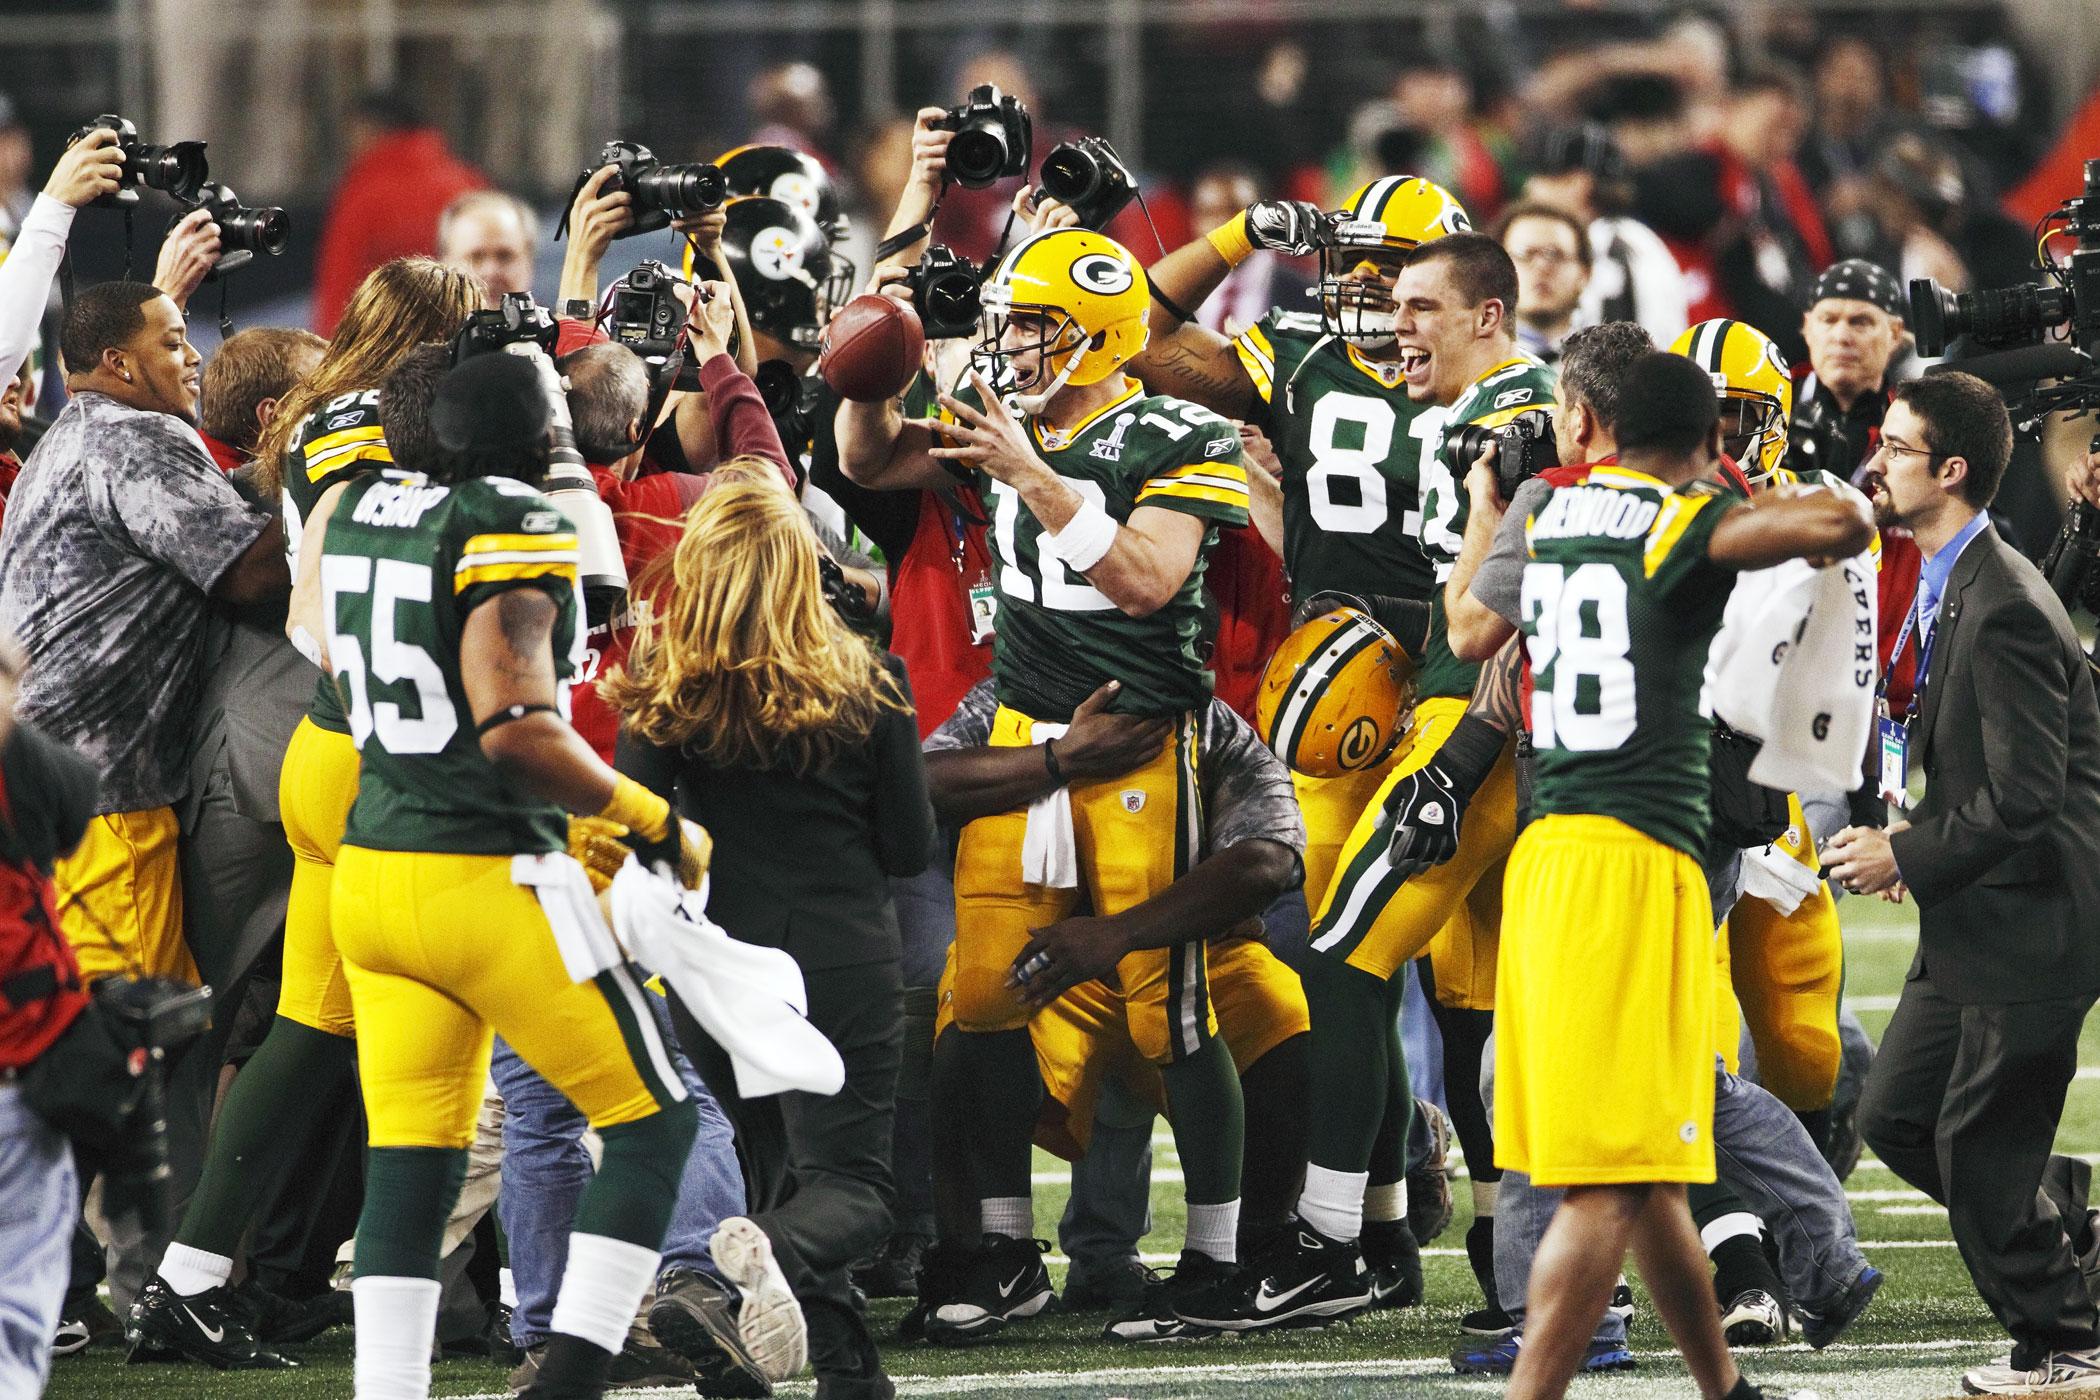 Super Bowl XLV, Feb. 6, 2011                               Green Bay Packers vs Pittsburgh Steelers in Arlington, Texas